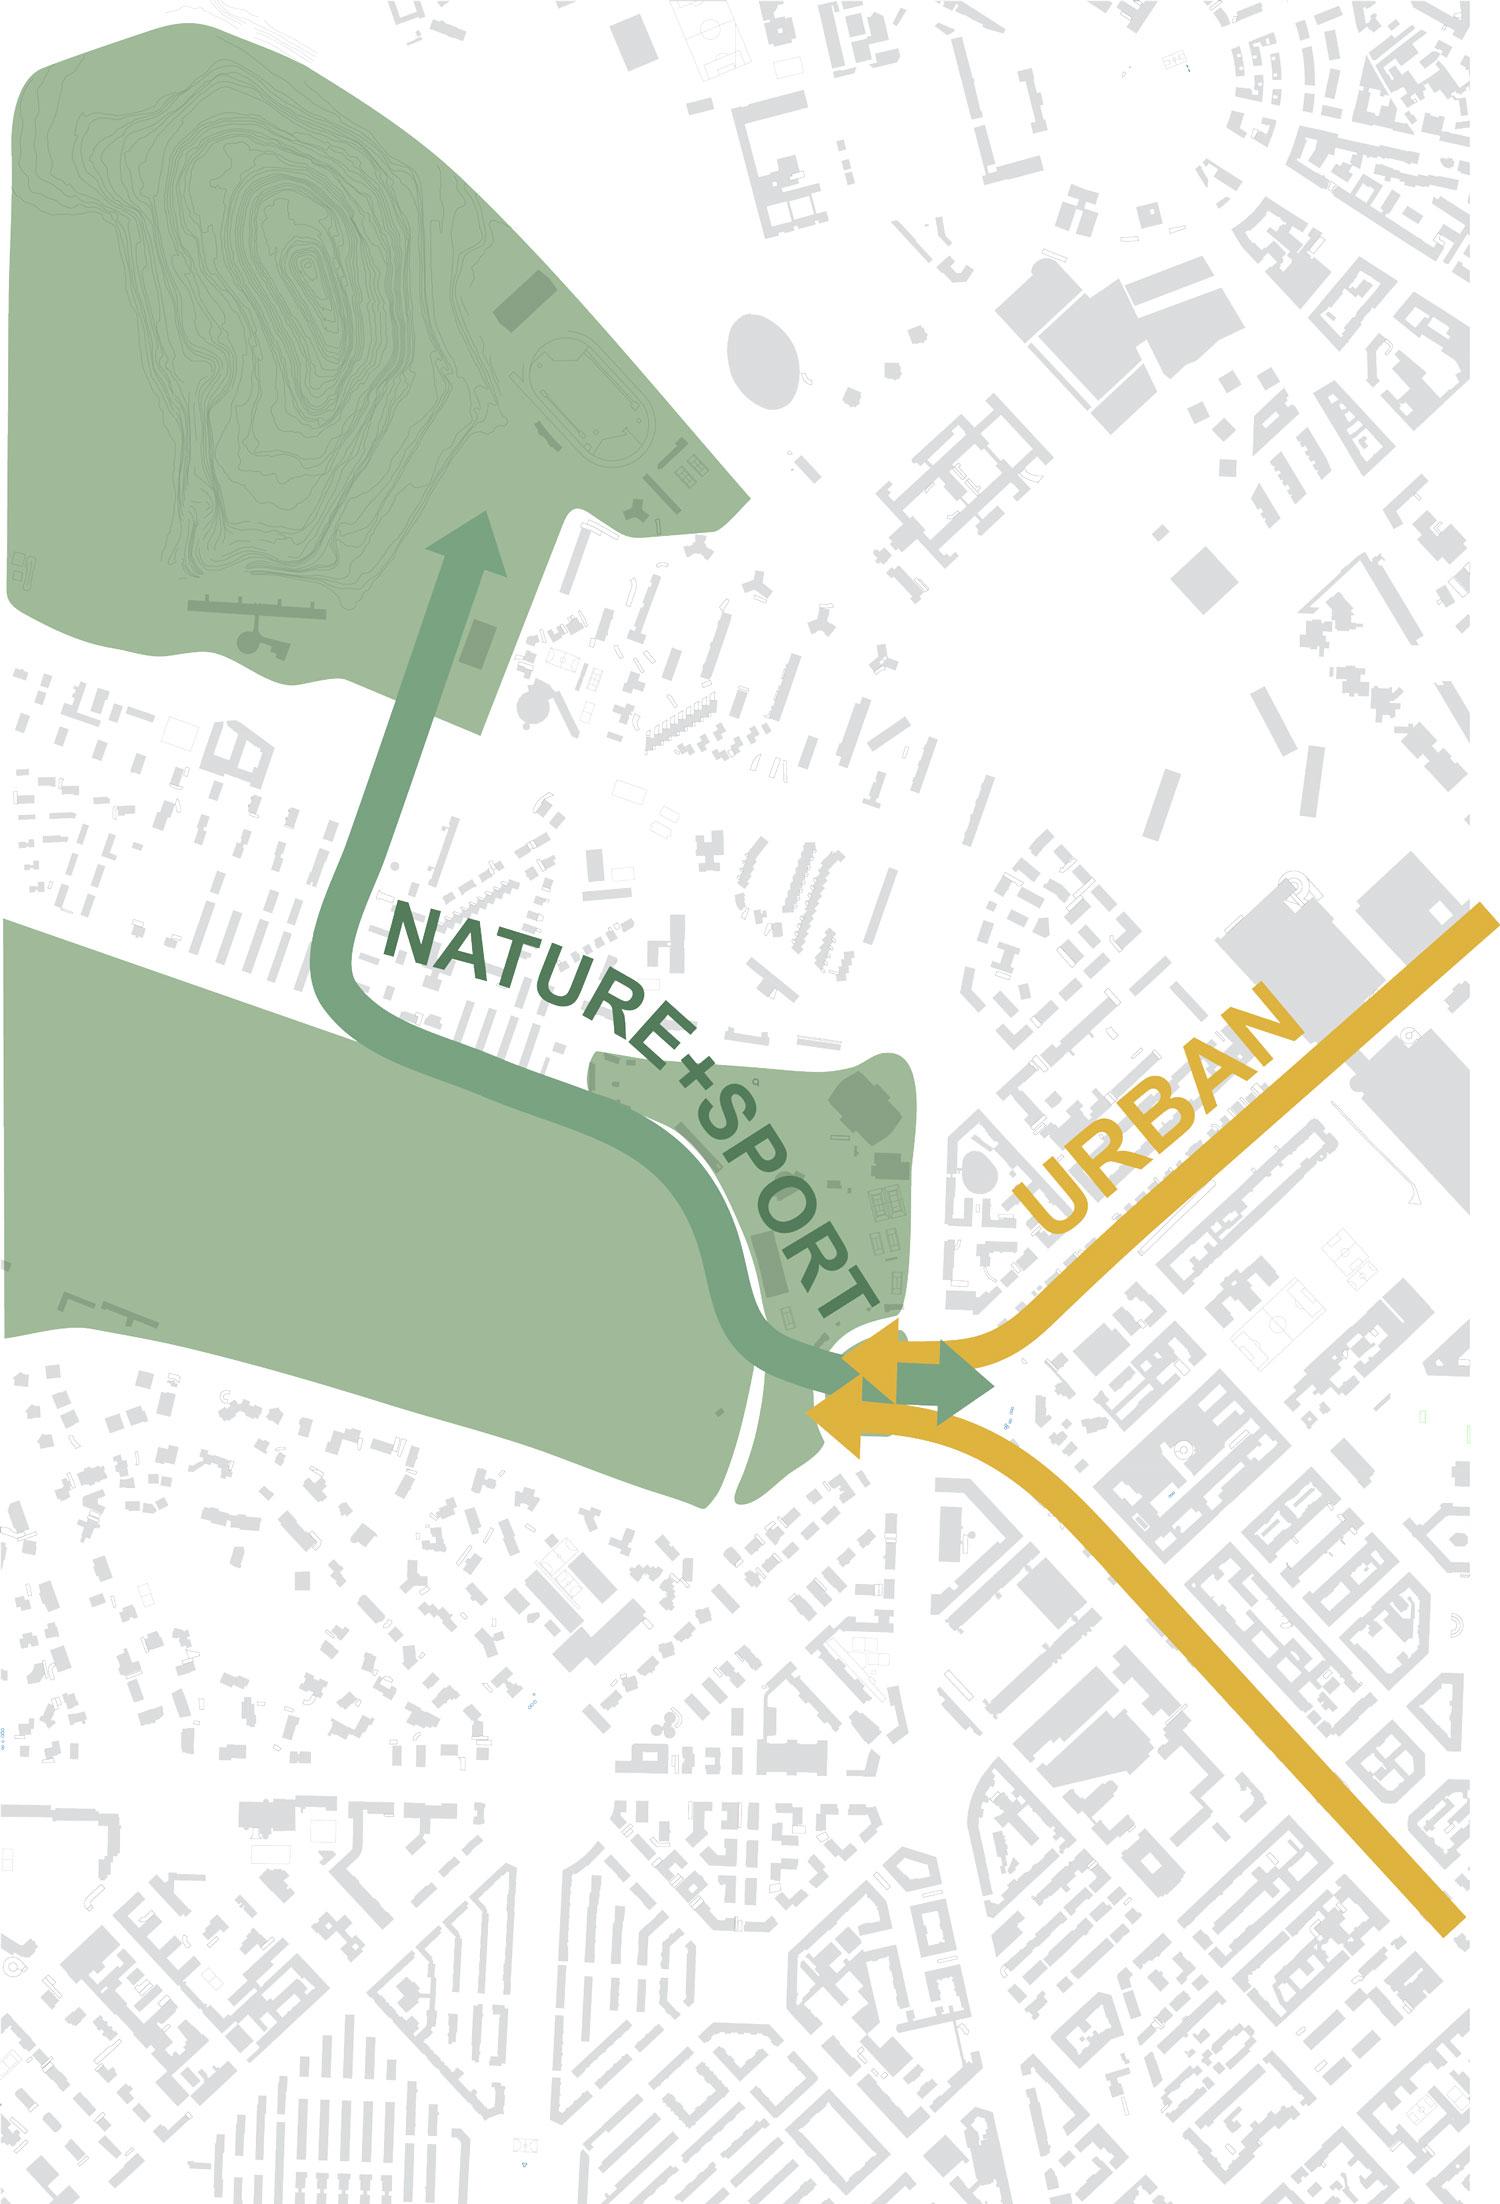 Urban-training-Nature+urban-planning Il Prisma}